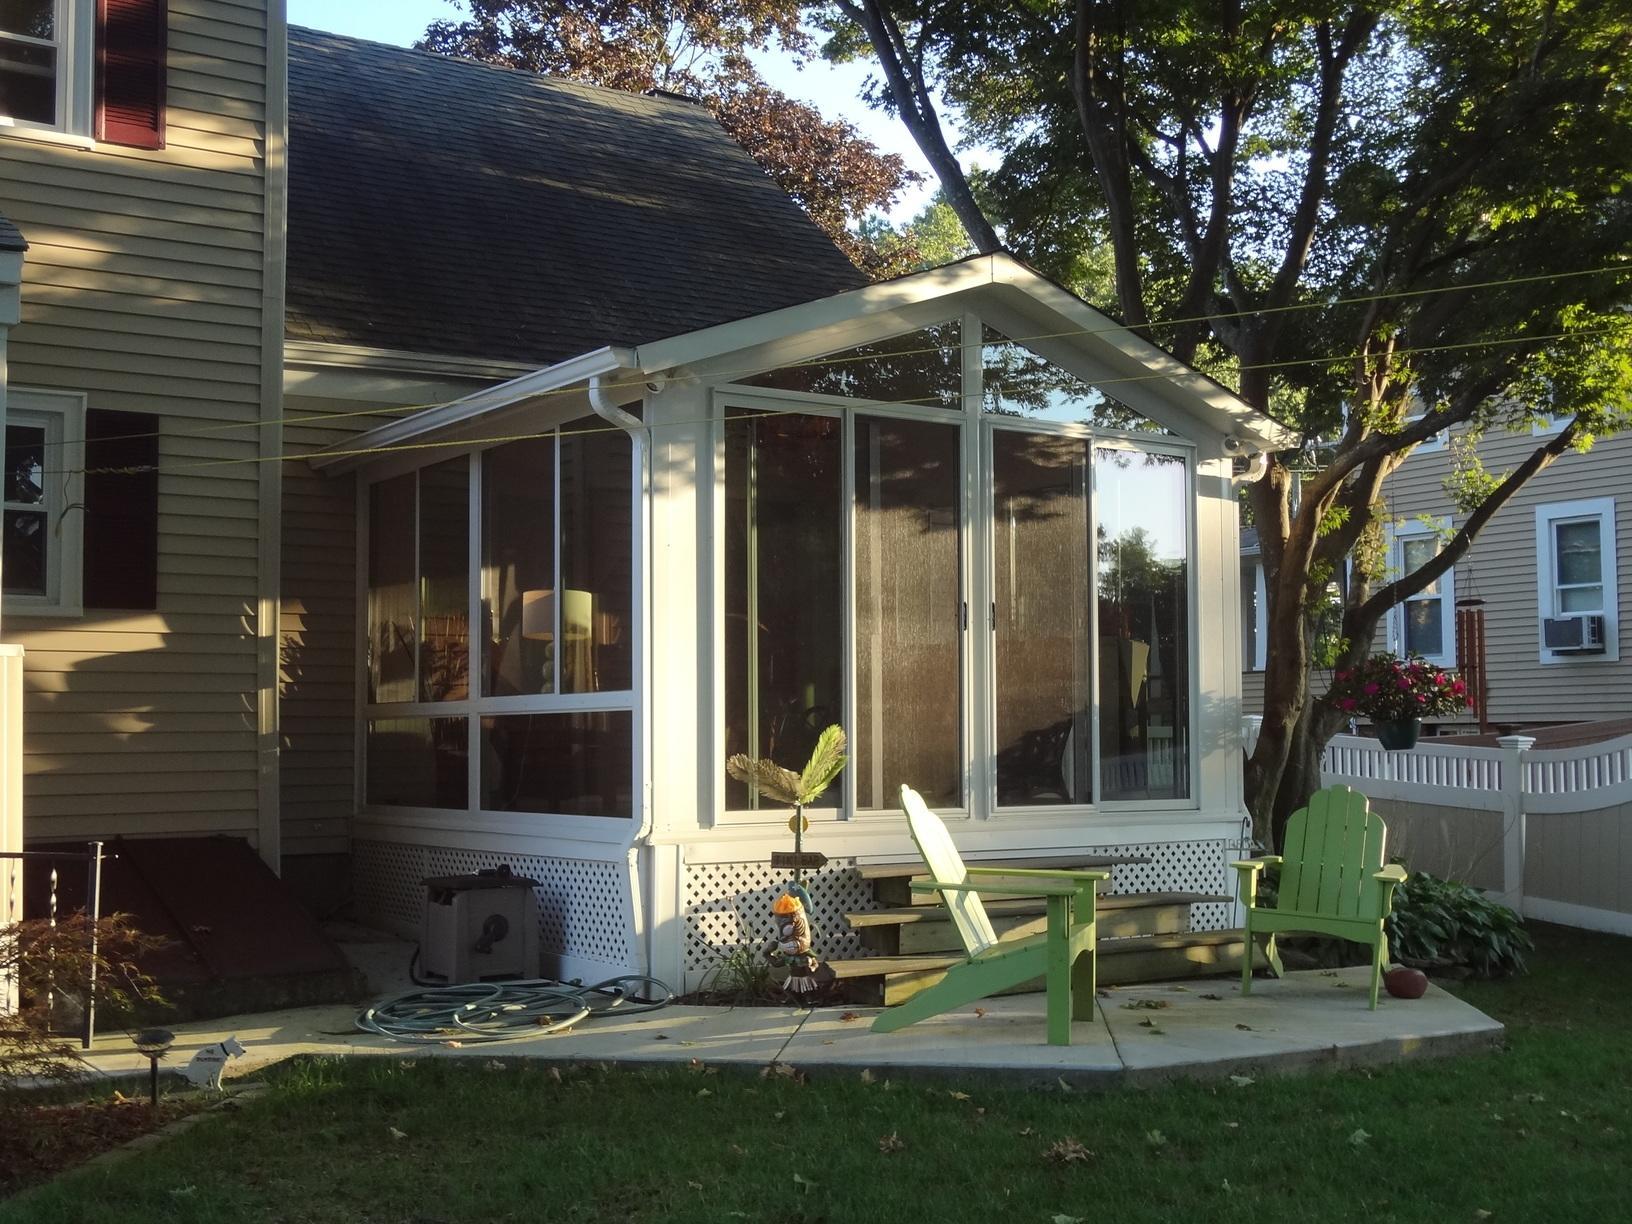 New Sunroom in East Hartford, CT